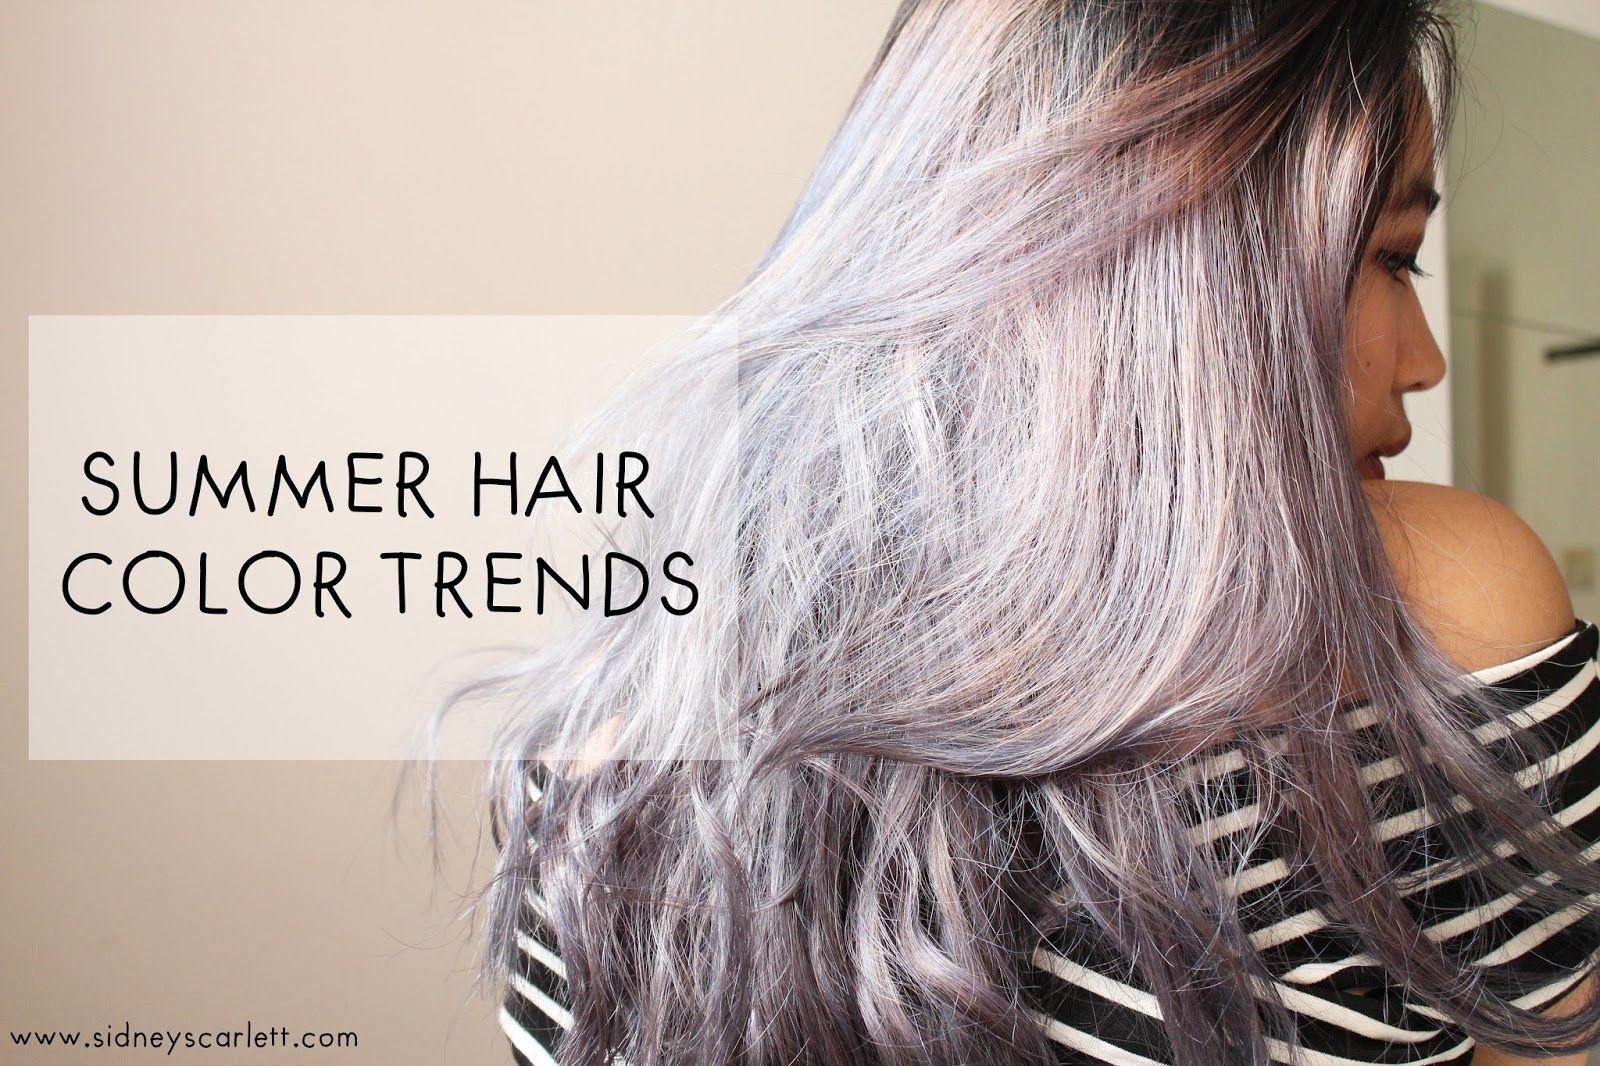 Sidney Scarlett | fashion | lifestyle | travel | personal blog: Ash Purple Hair for Summer 2017